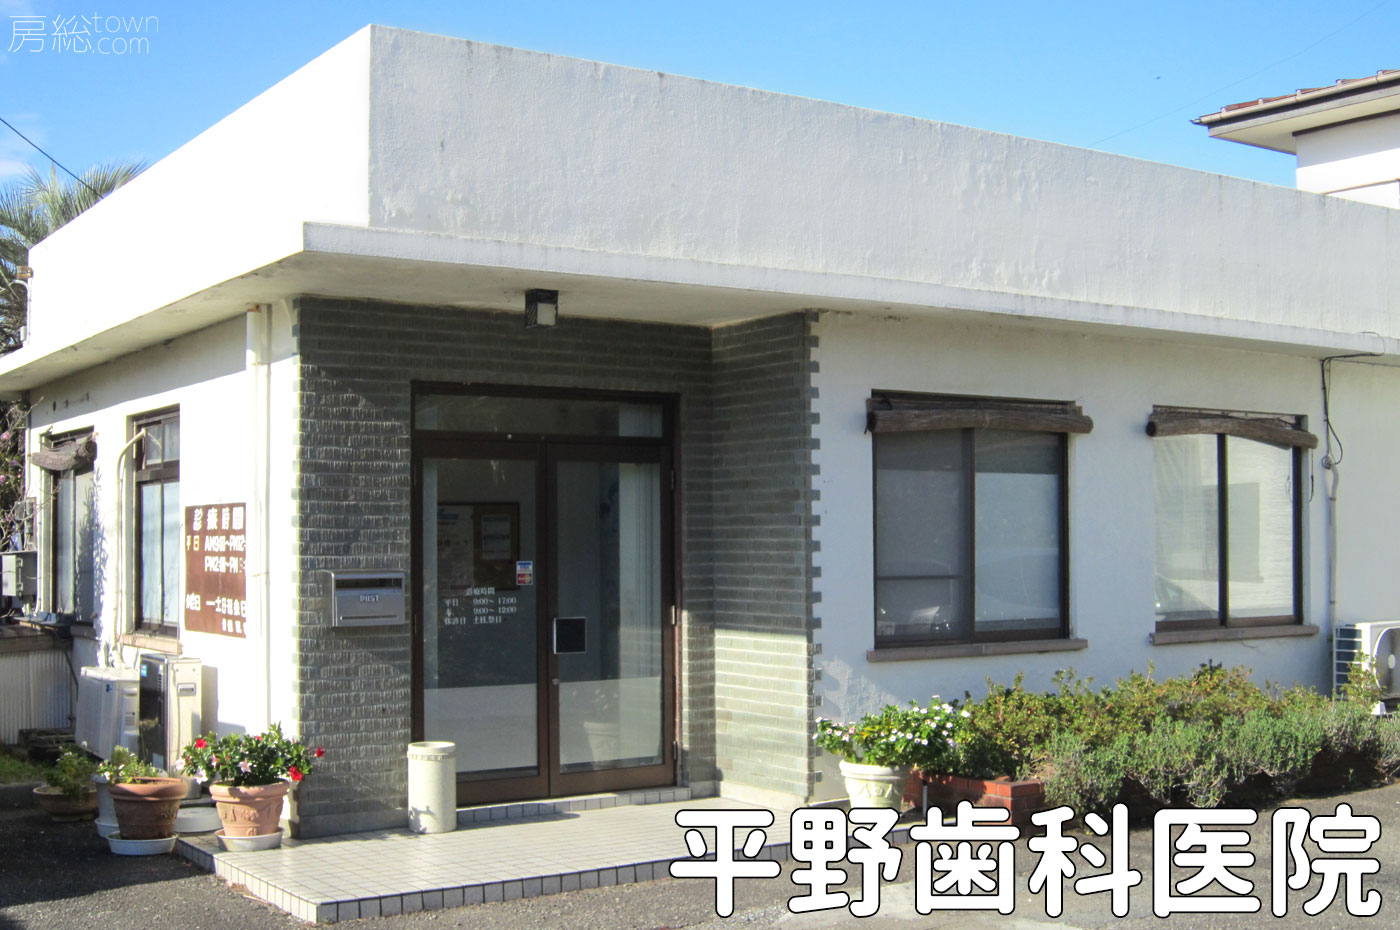 平野歯科医院の入口